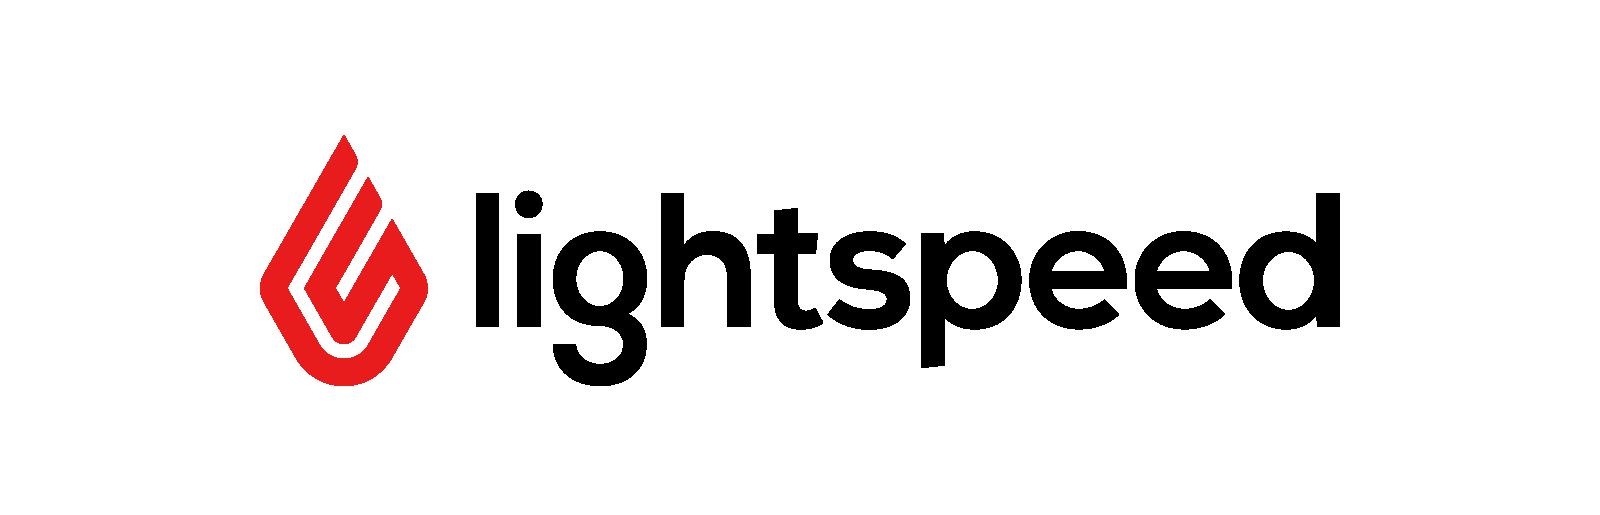 Lightspeed_Logo_RedBlack